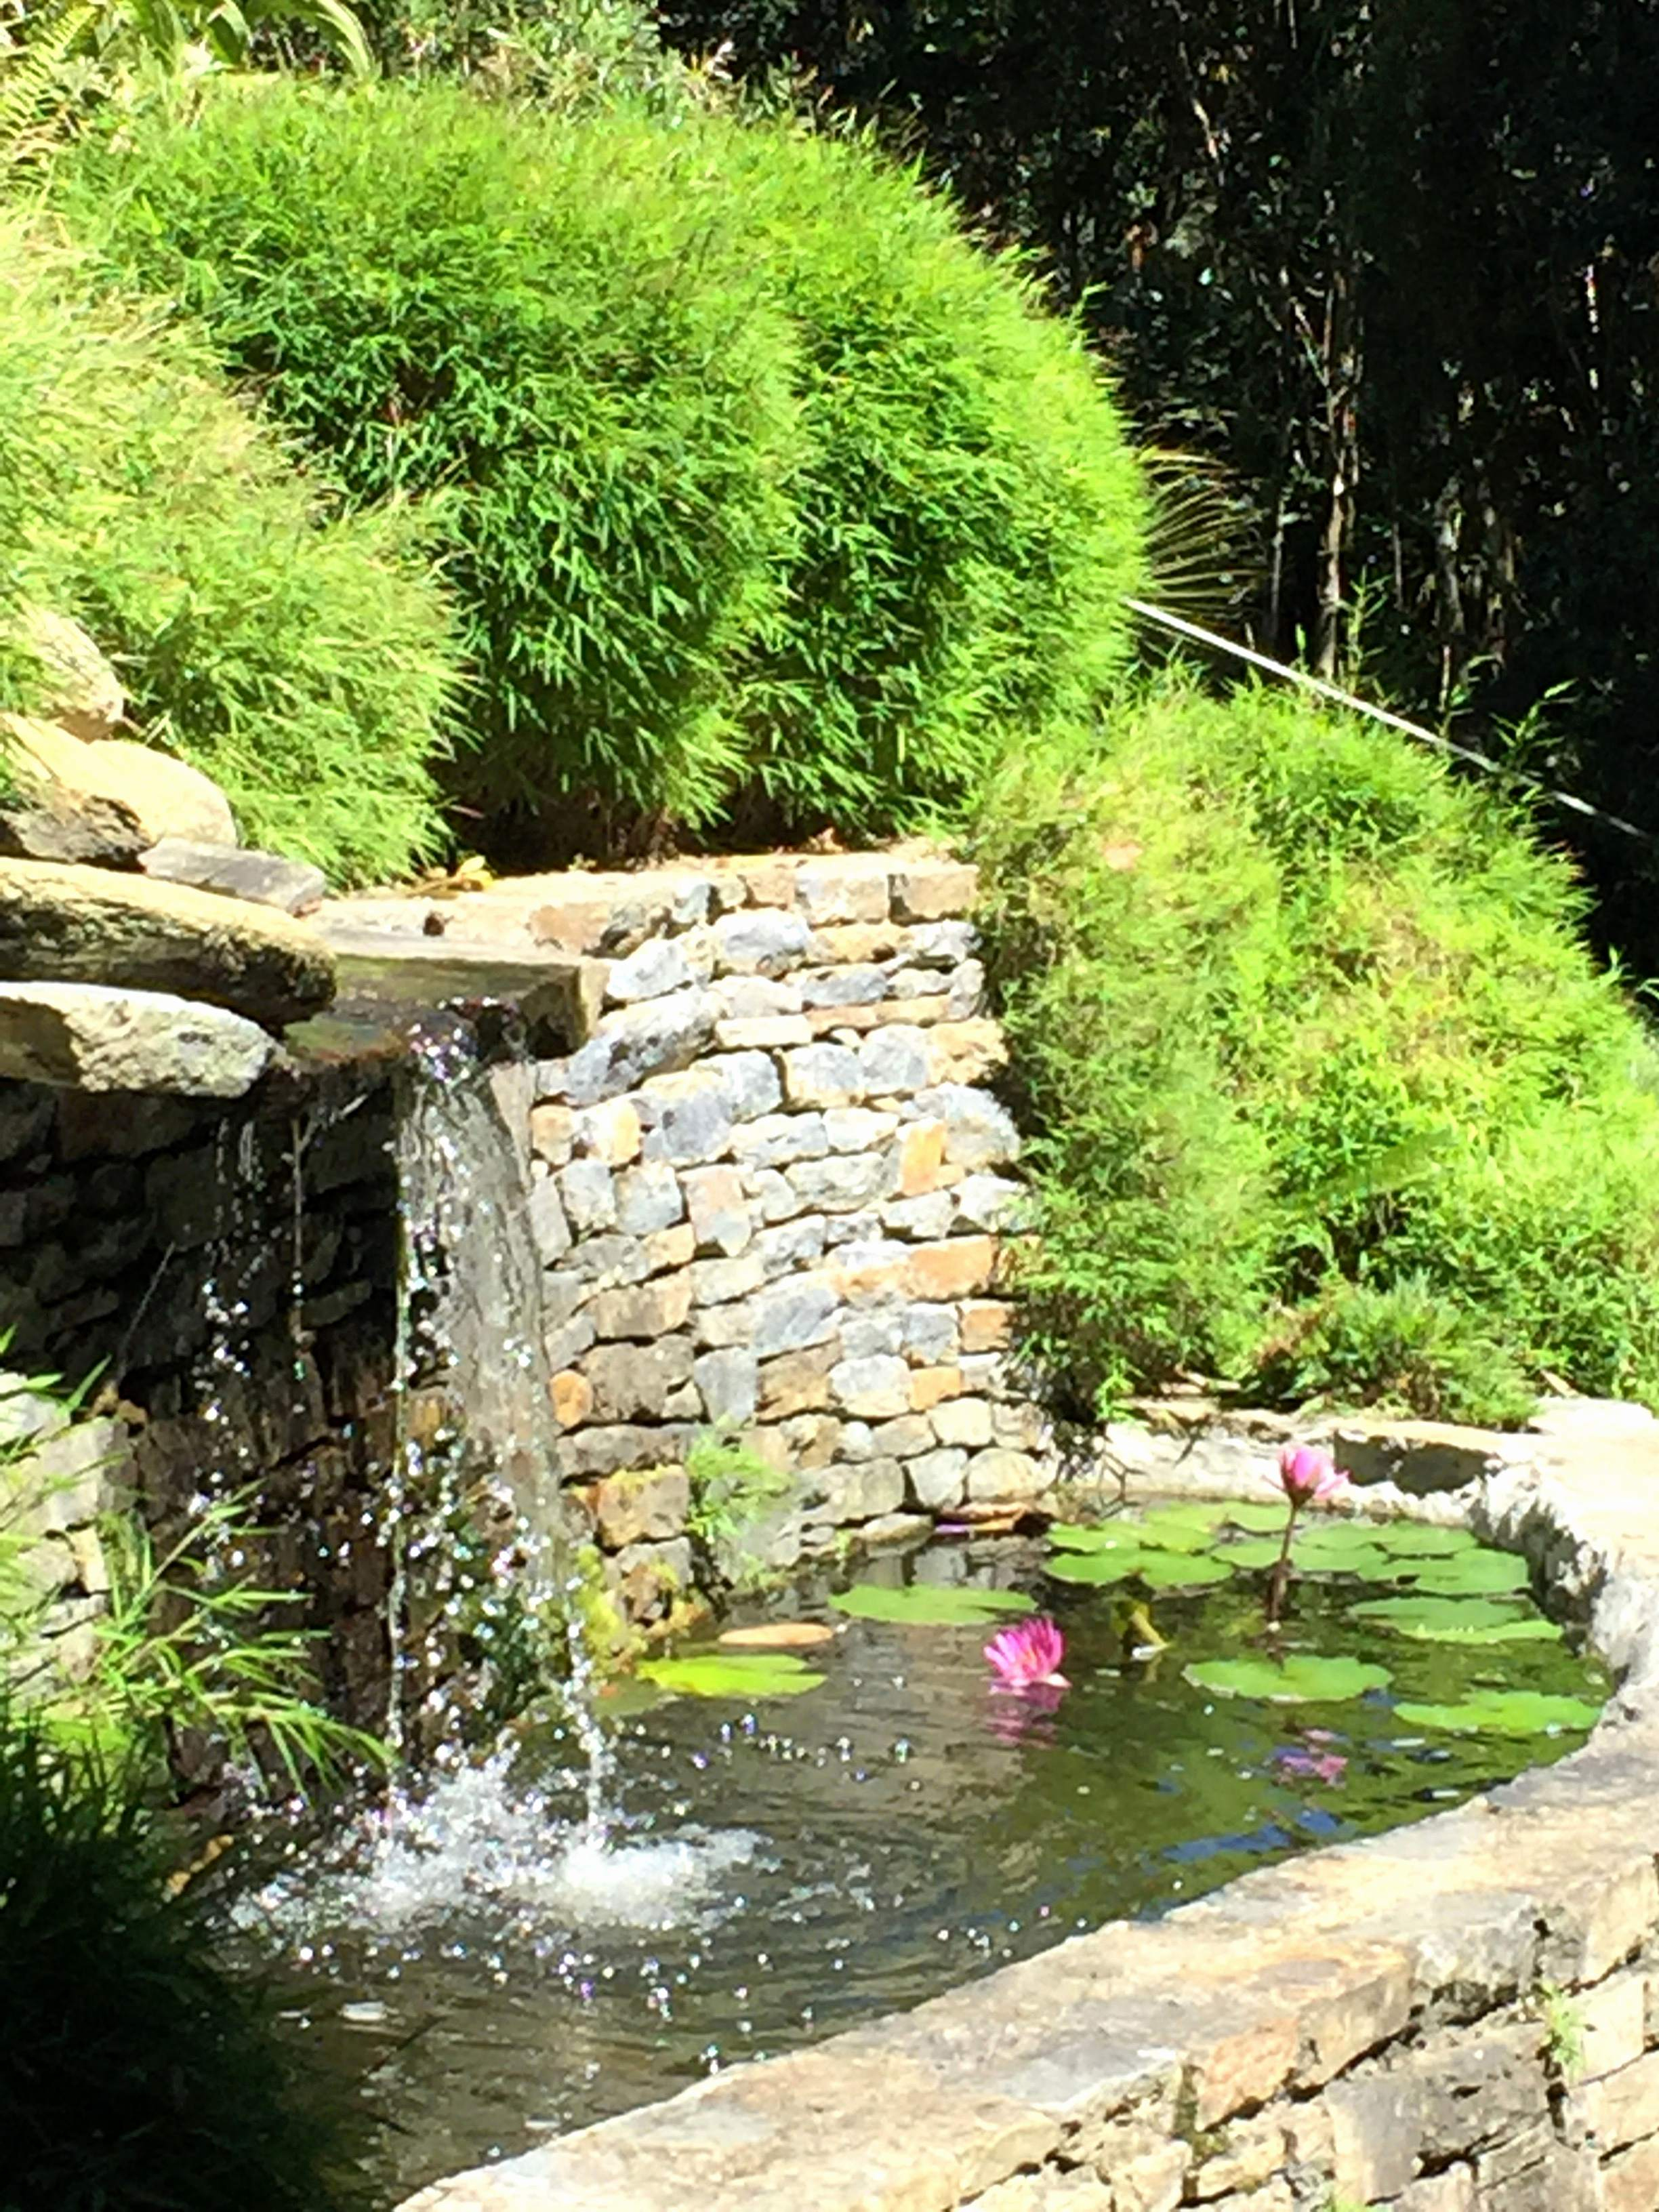 Bassin Jardin Moderne Inspirant Photos Deco Jardin Zen Nouveau Deco Bassin De Jardin Luxe Decoration Pour